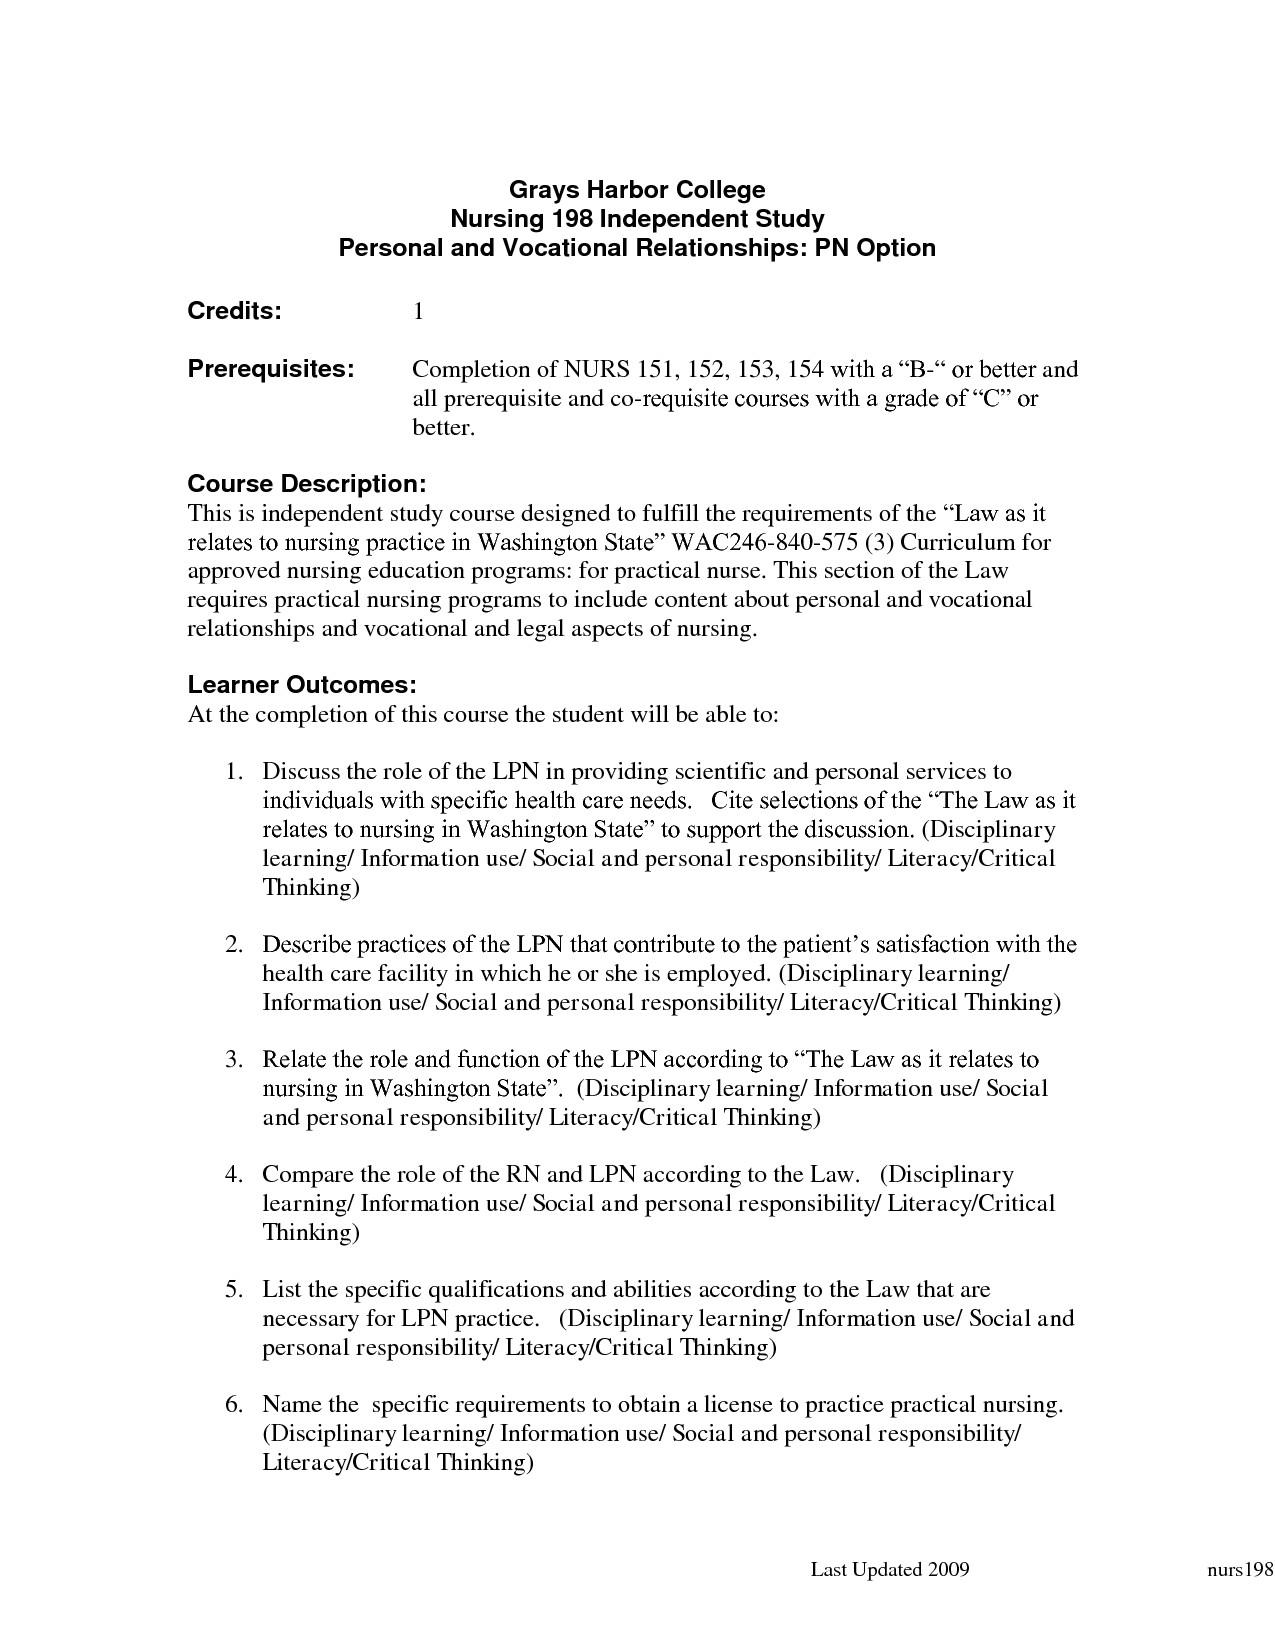 new graduate licensed practical nurse resume template